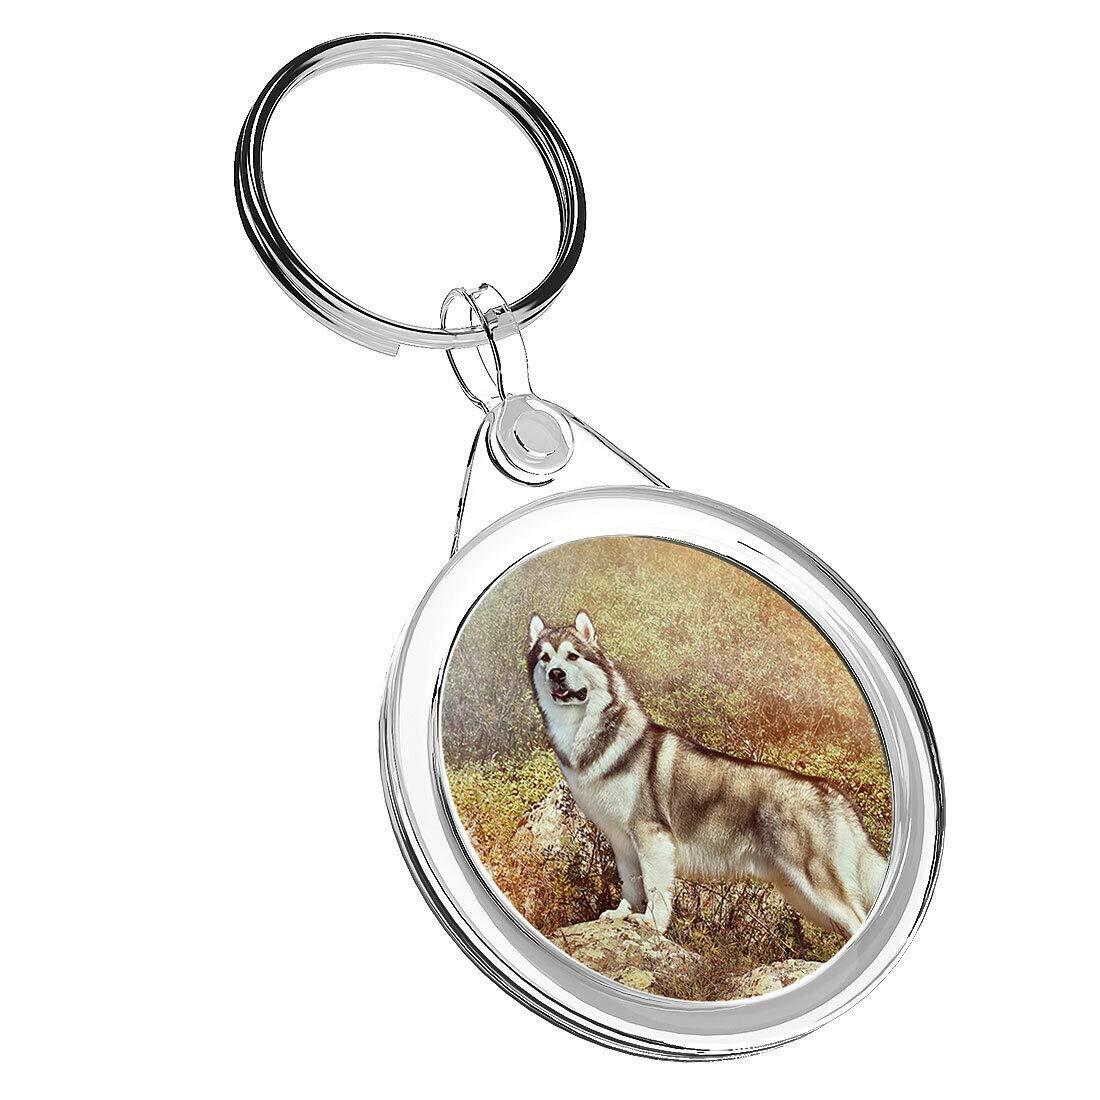 Destination Vinyl Keyrings 1 x Alaskan Malamute Wolf Dog – Keyring IR02 Mum Dad Kids Birthday Gift #15806